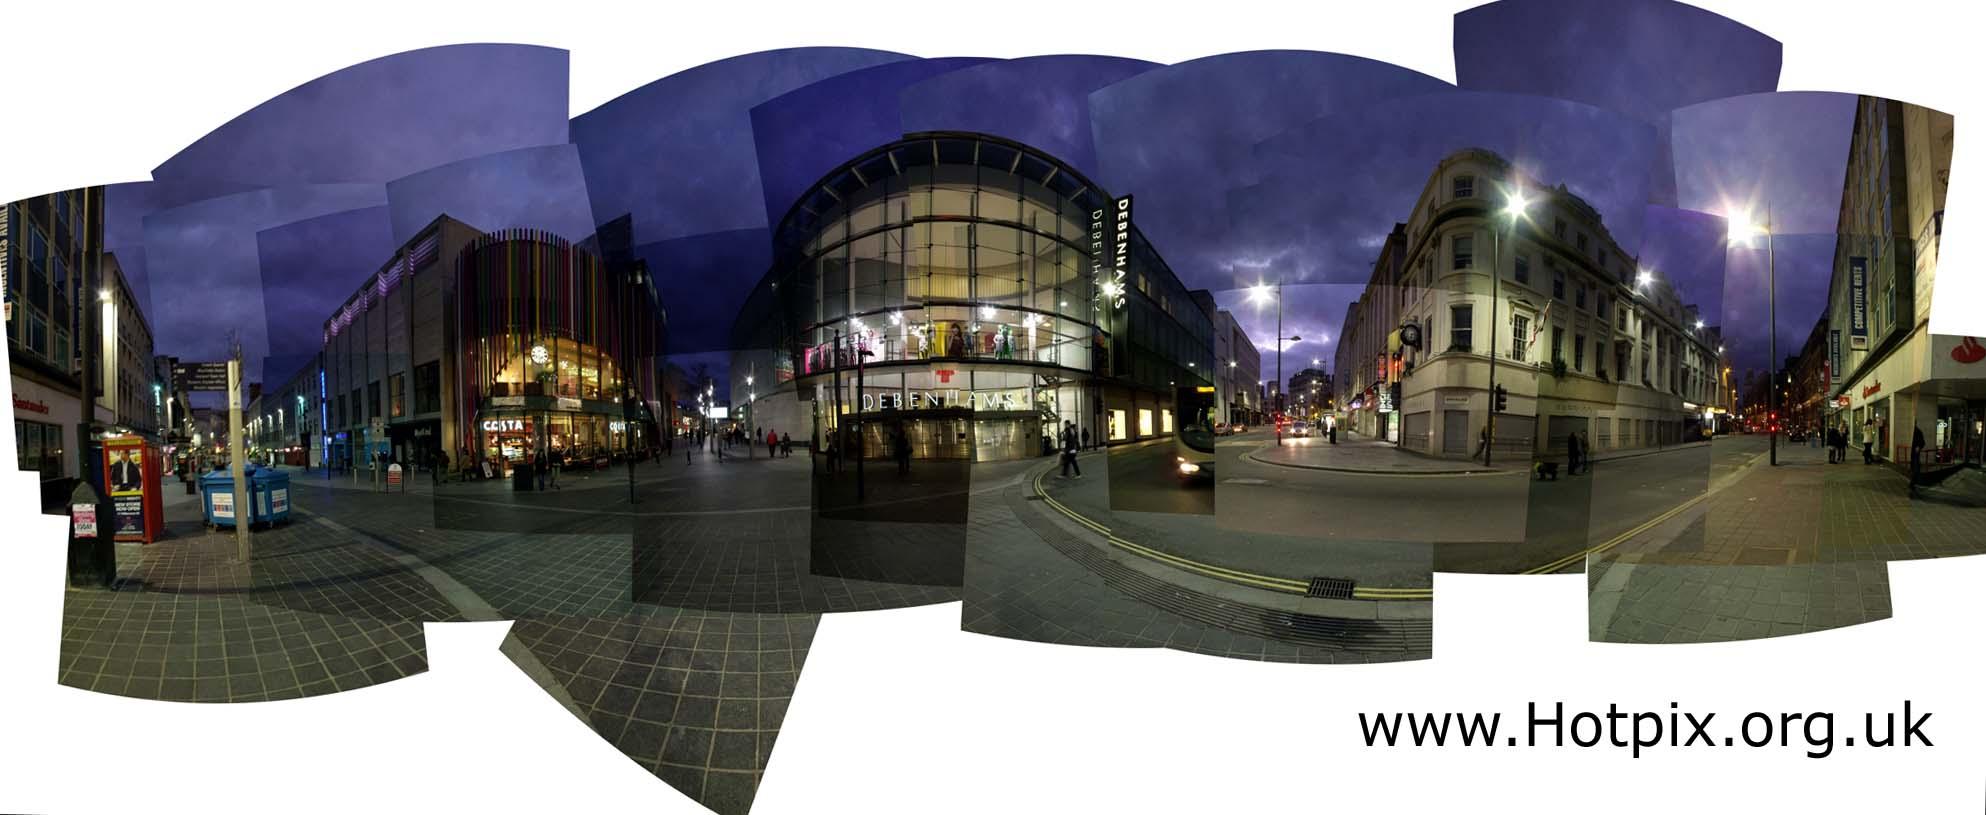 Liverpool,pano,joiner,hockney,tony,smith,tonysmith,hotpix,tonysmithhotpix,uk,beatlecity,beatles,city,england,liver,mersey,dusk,night,shot,shops,tourist,hotpix.com,#tonysmithotpix